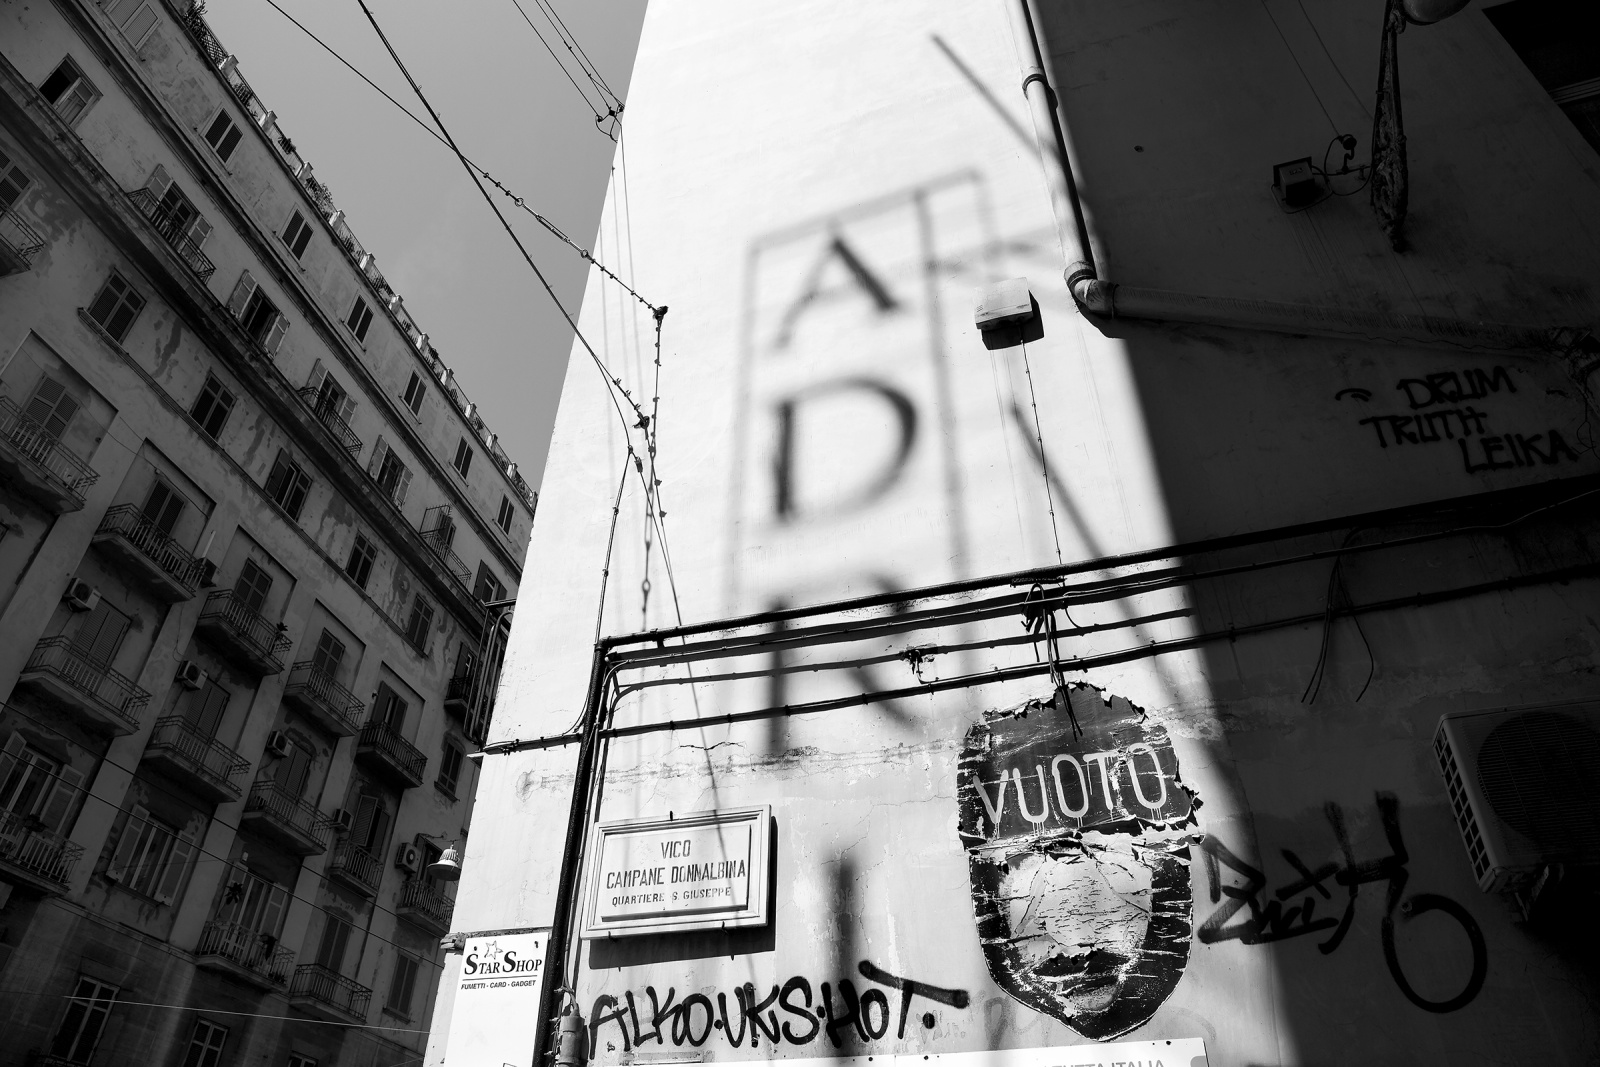 NAPOLI-IDENTITA' URBANE B/N